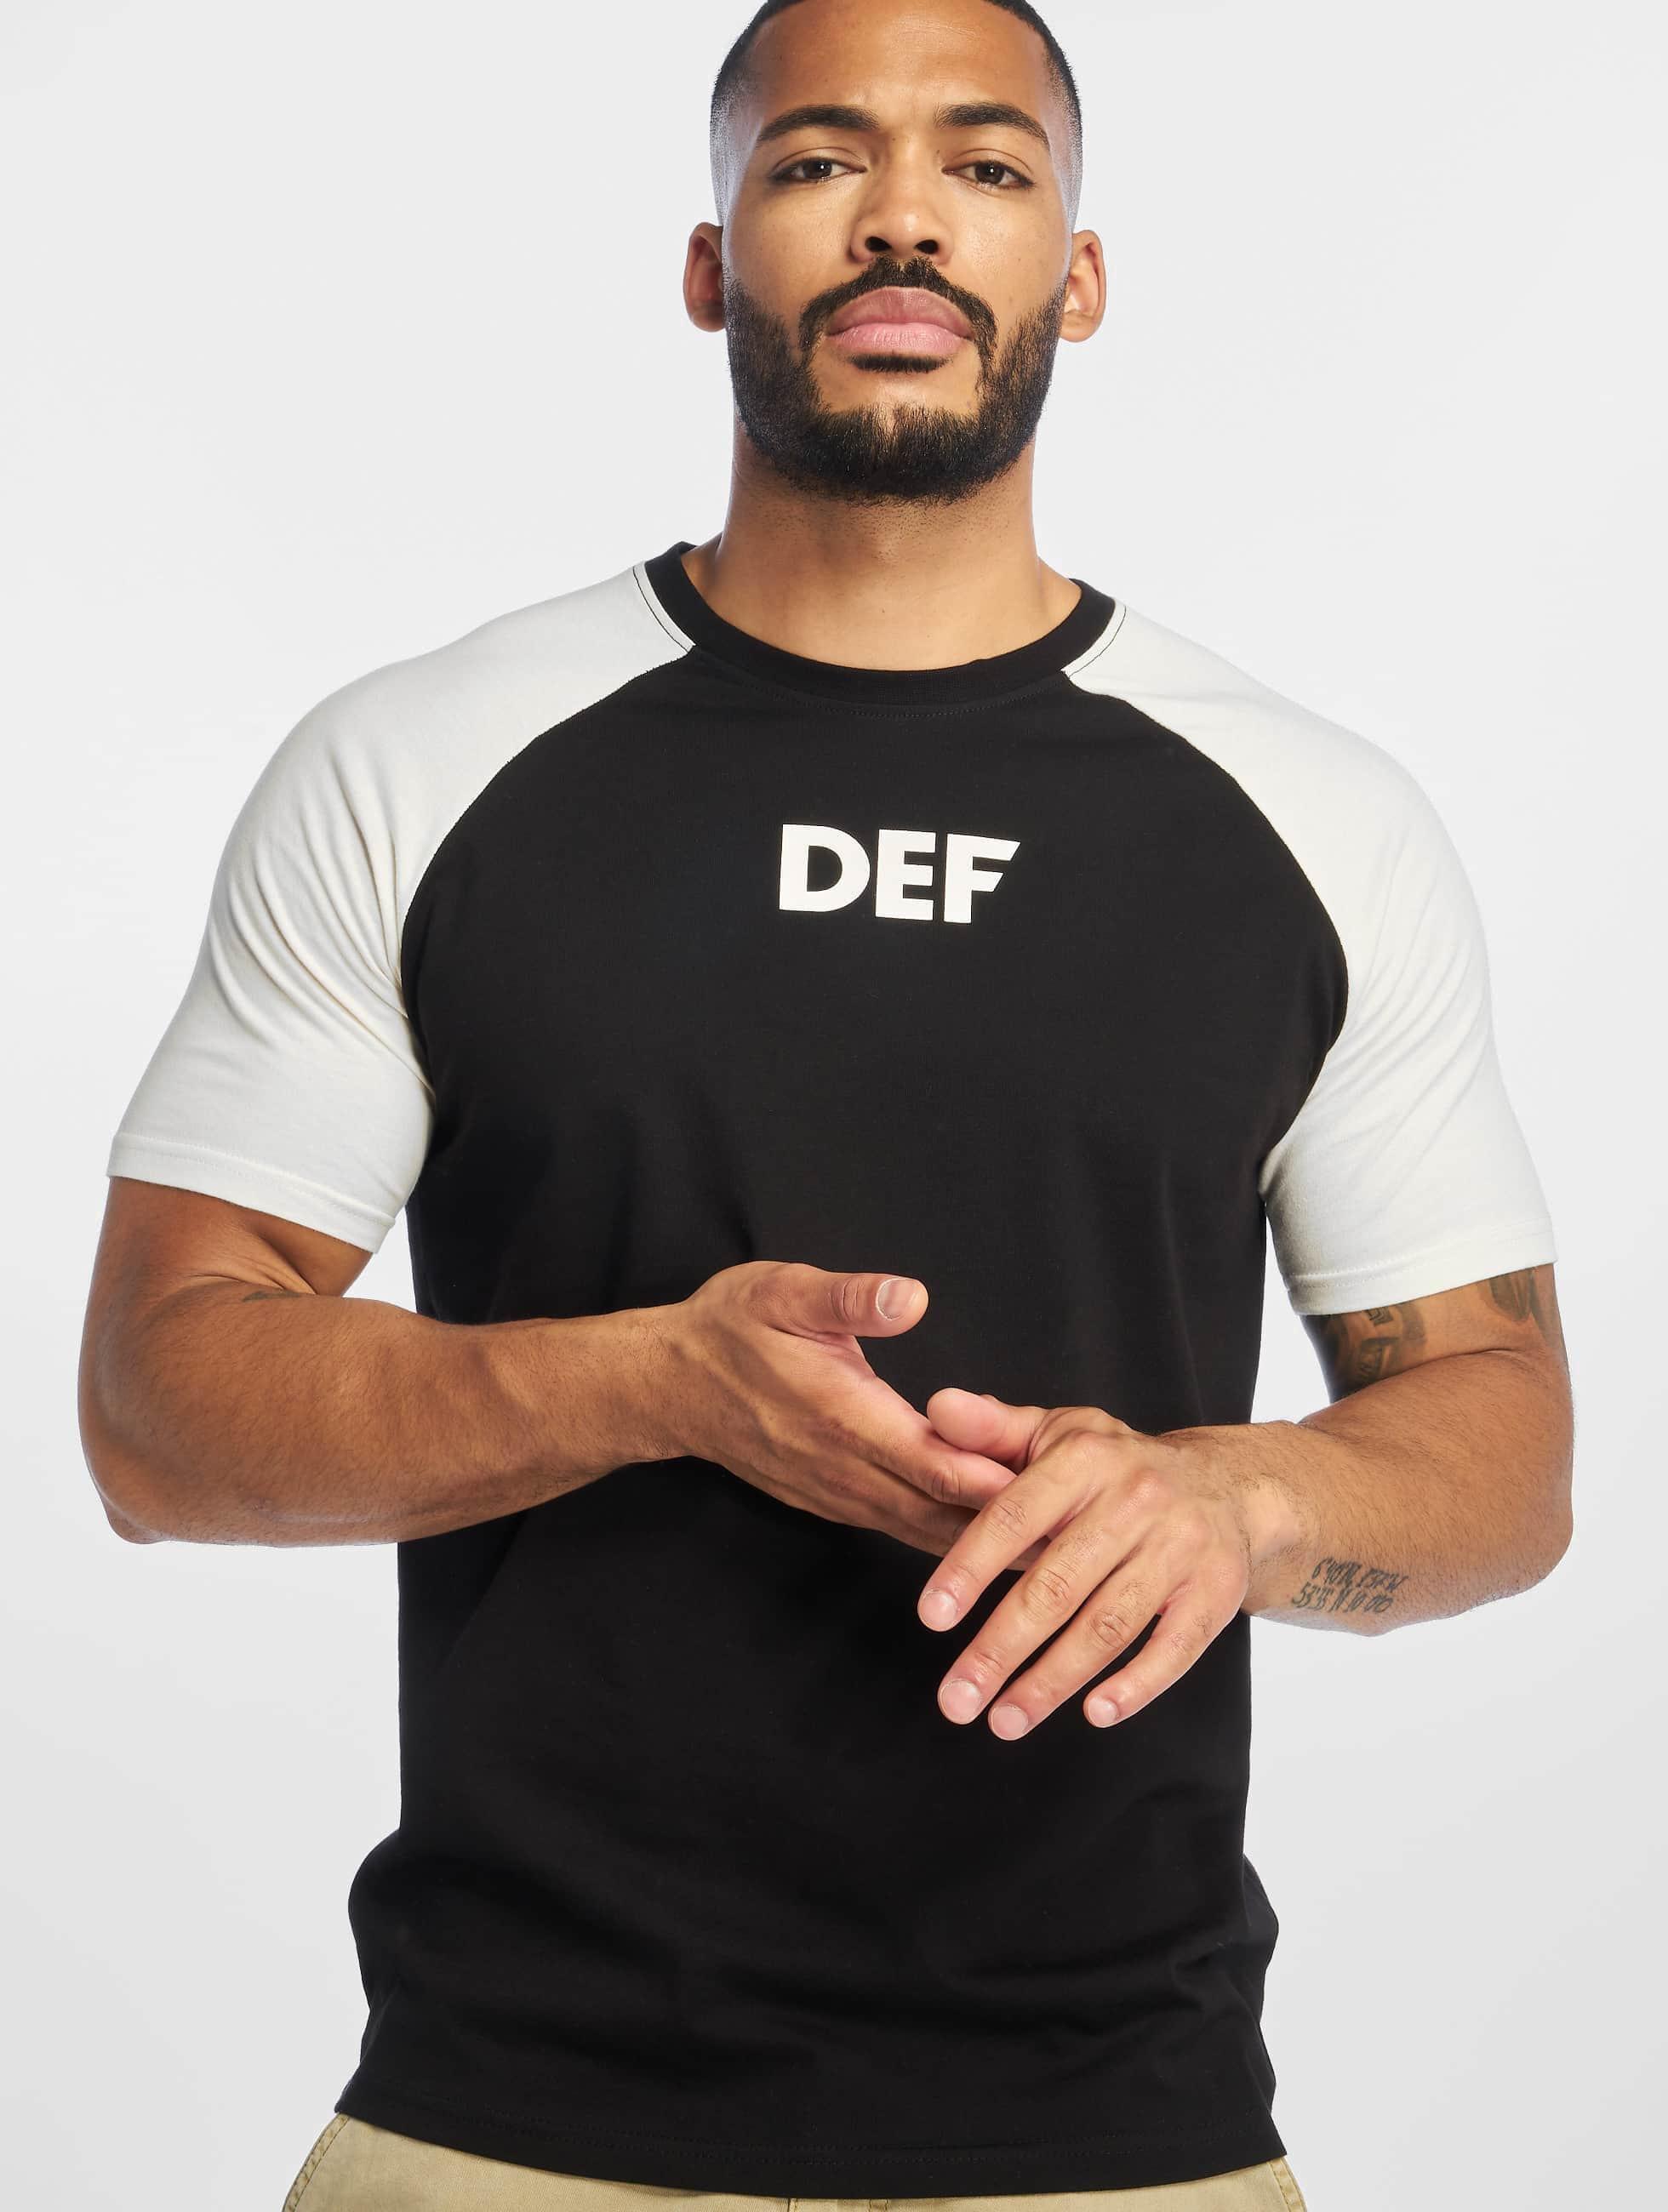 DEF / T-Shirt Case in black S